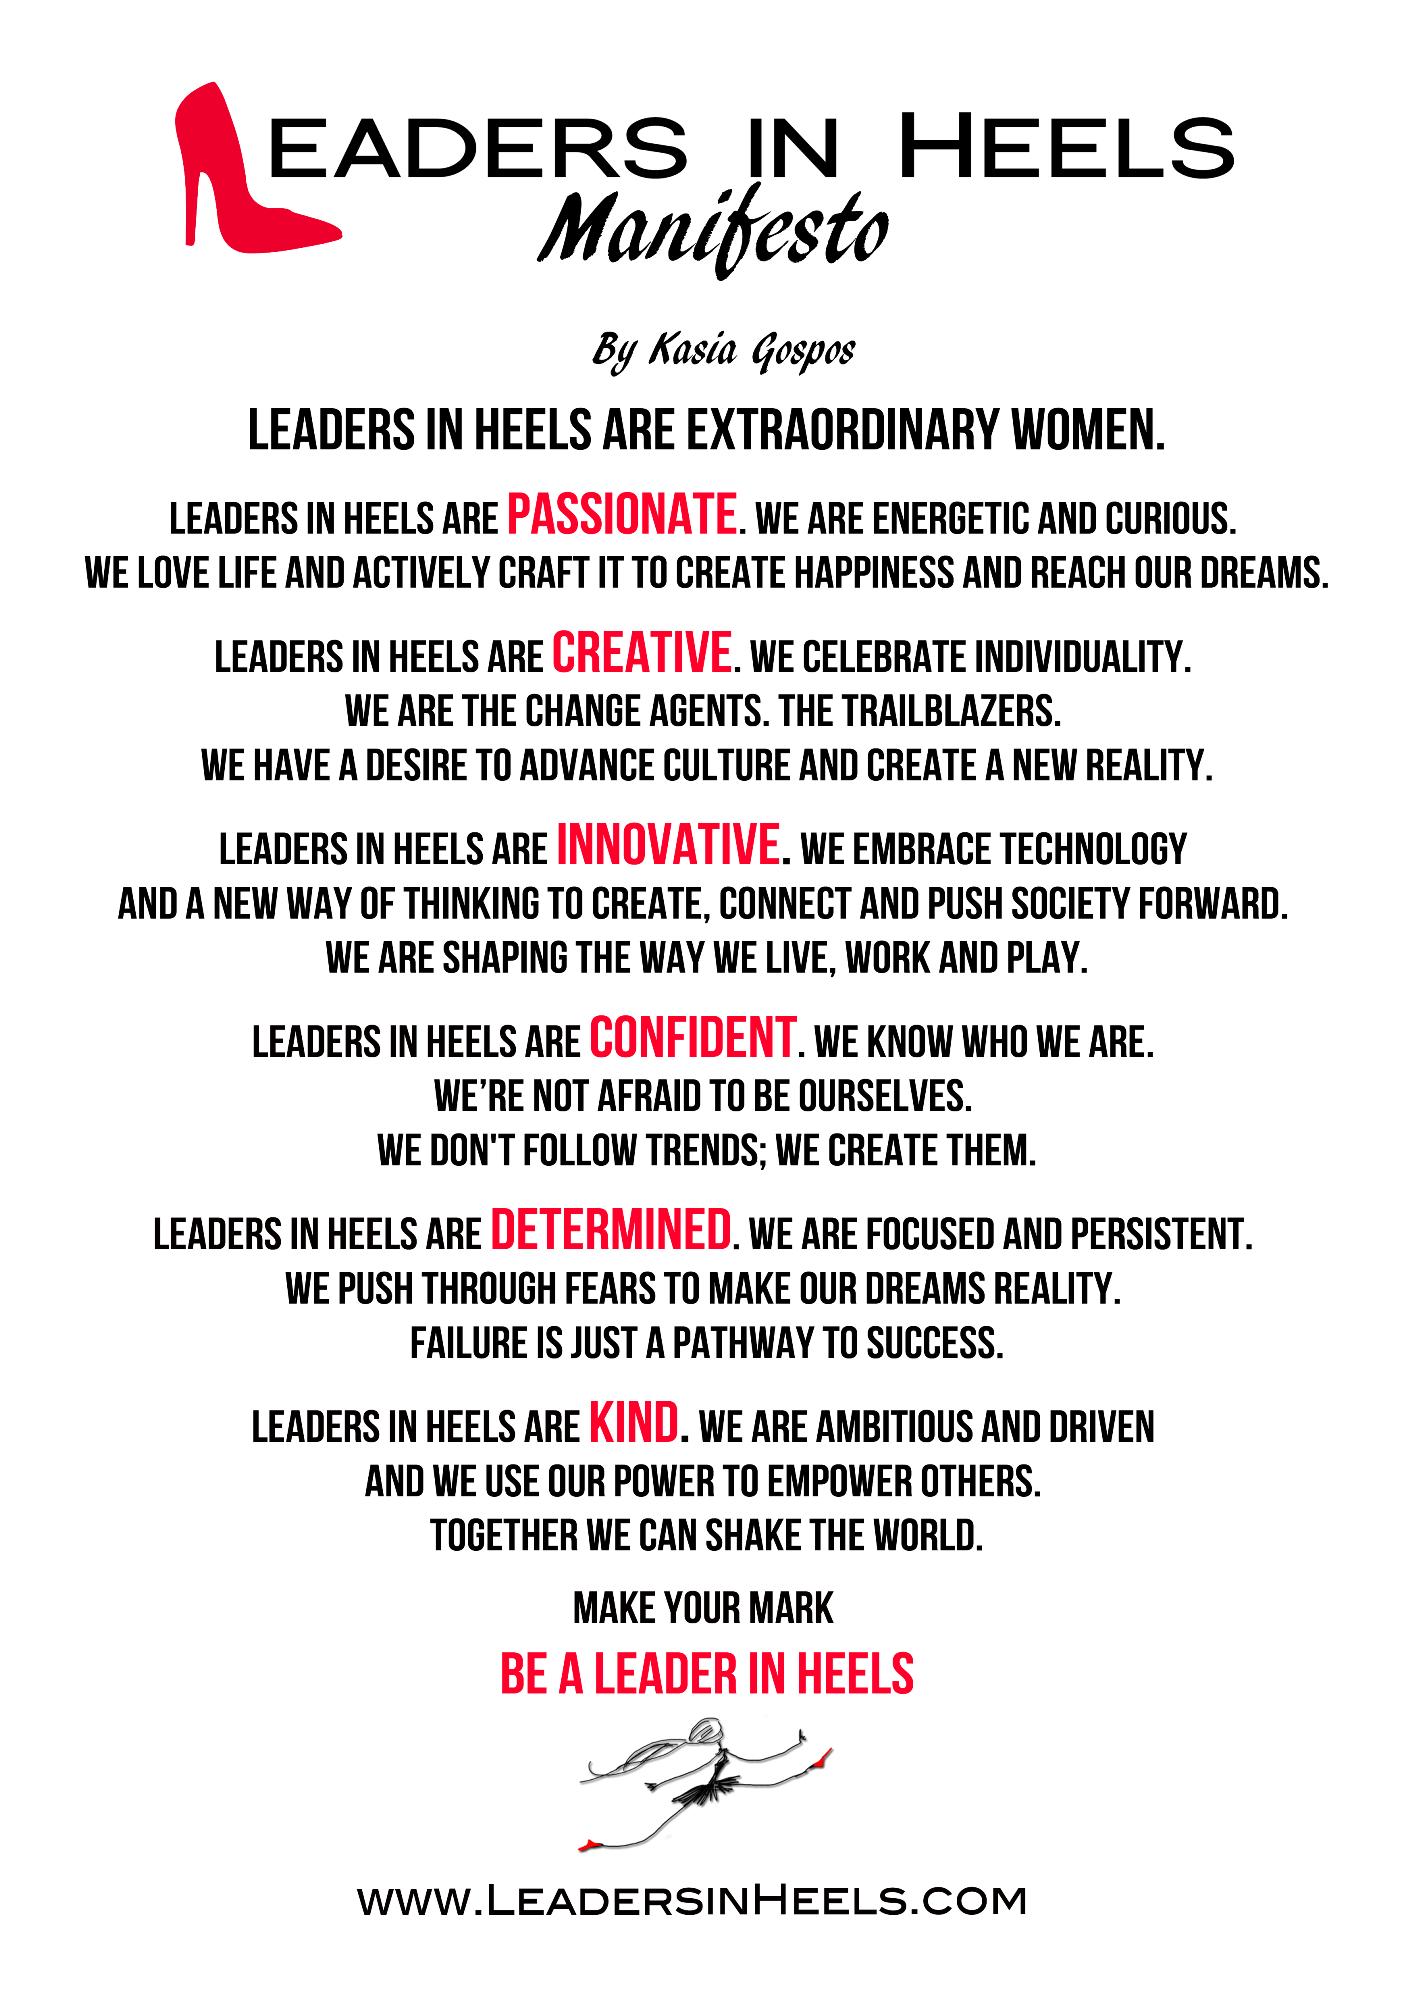 leadership traits of successful female leaders career tips 6 leadership traits of successful female leaders